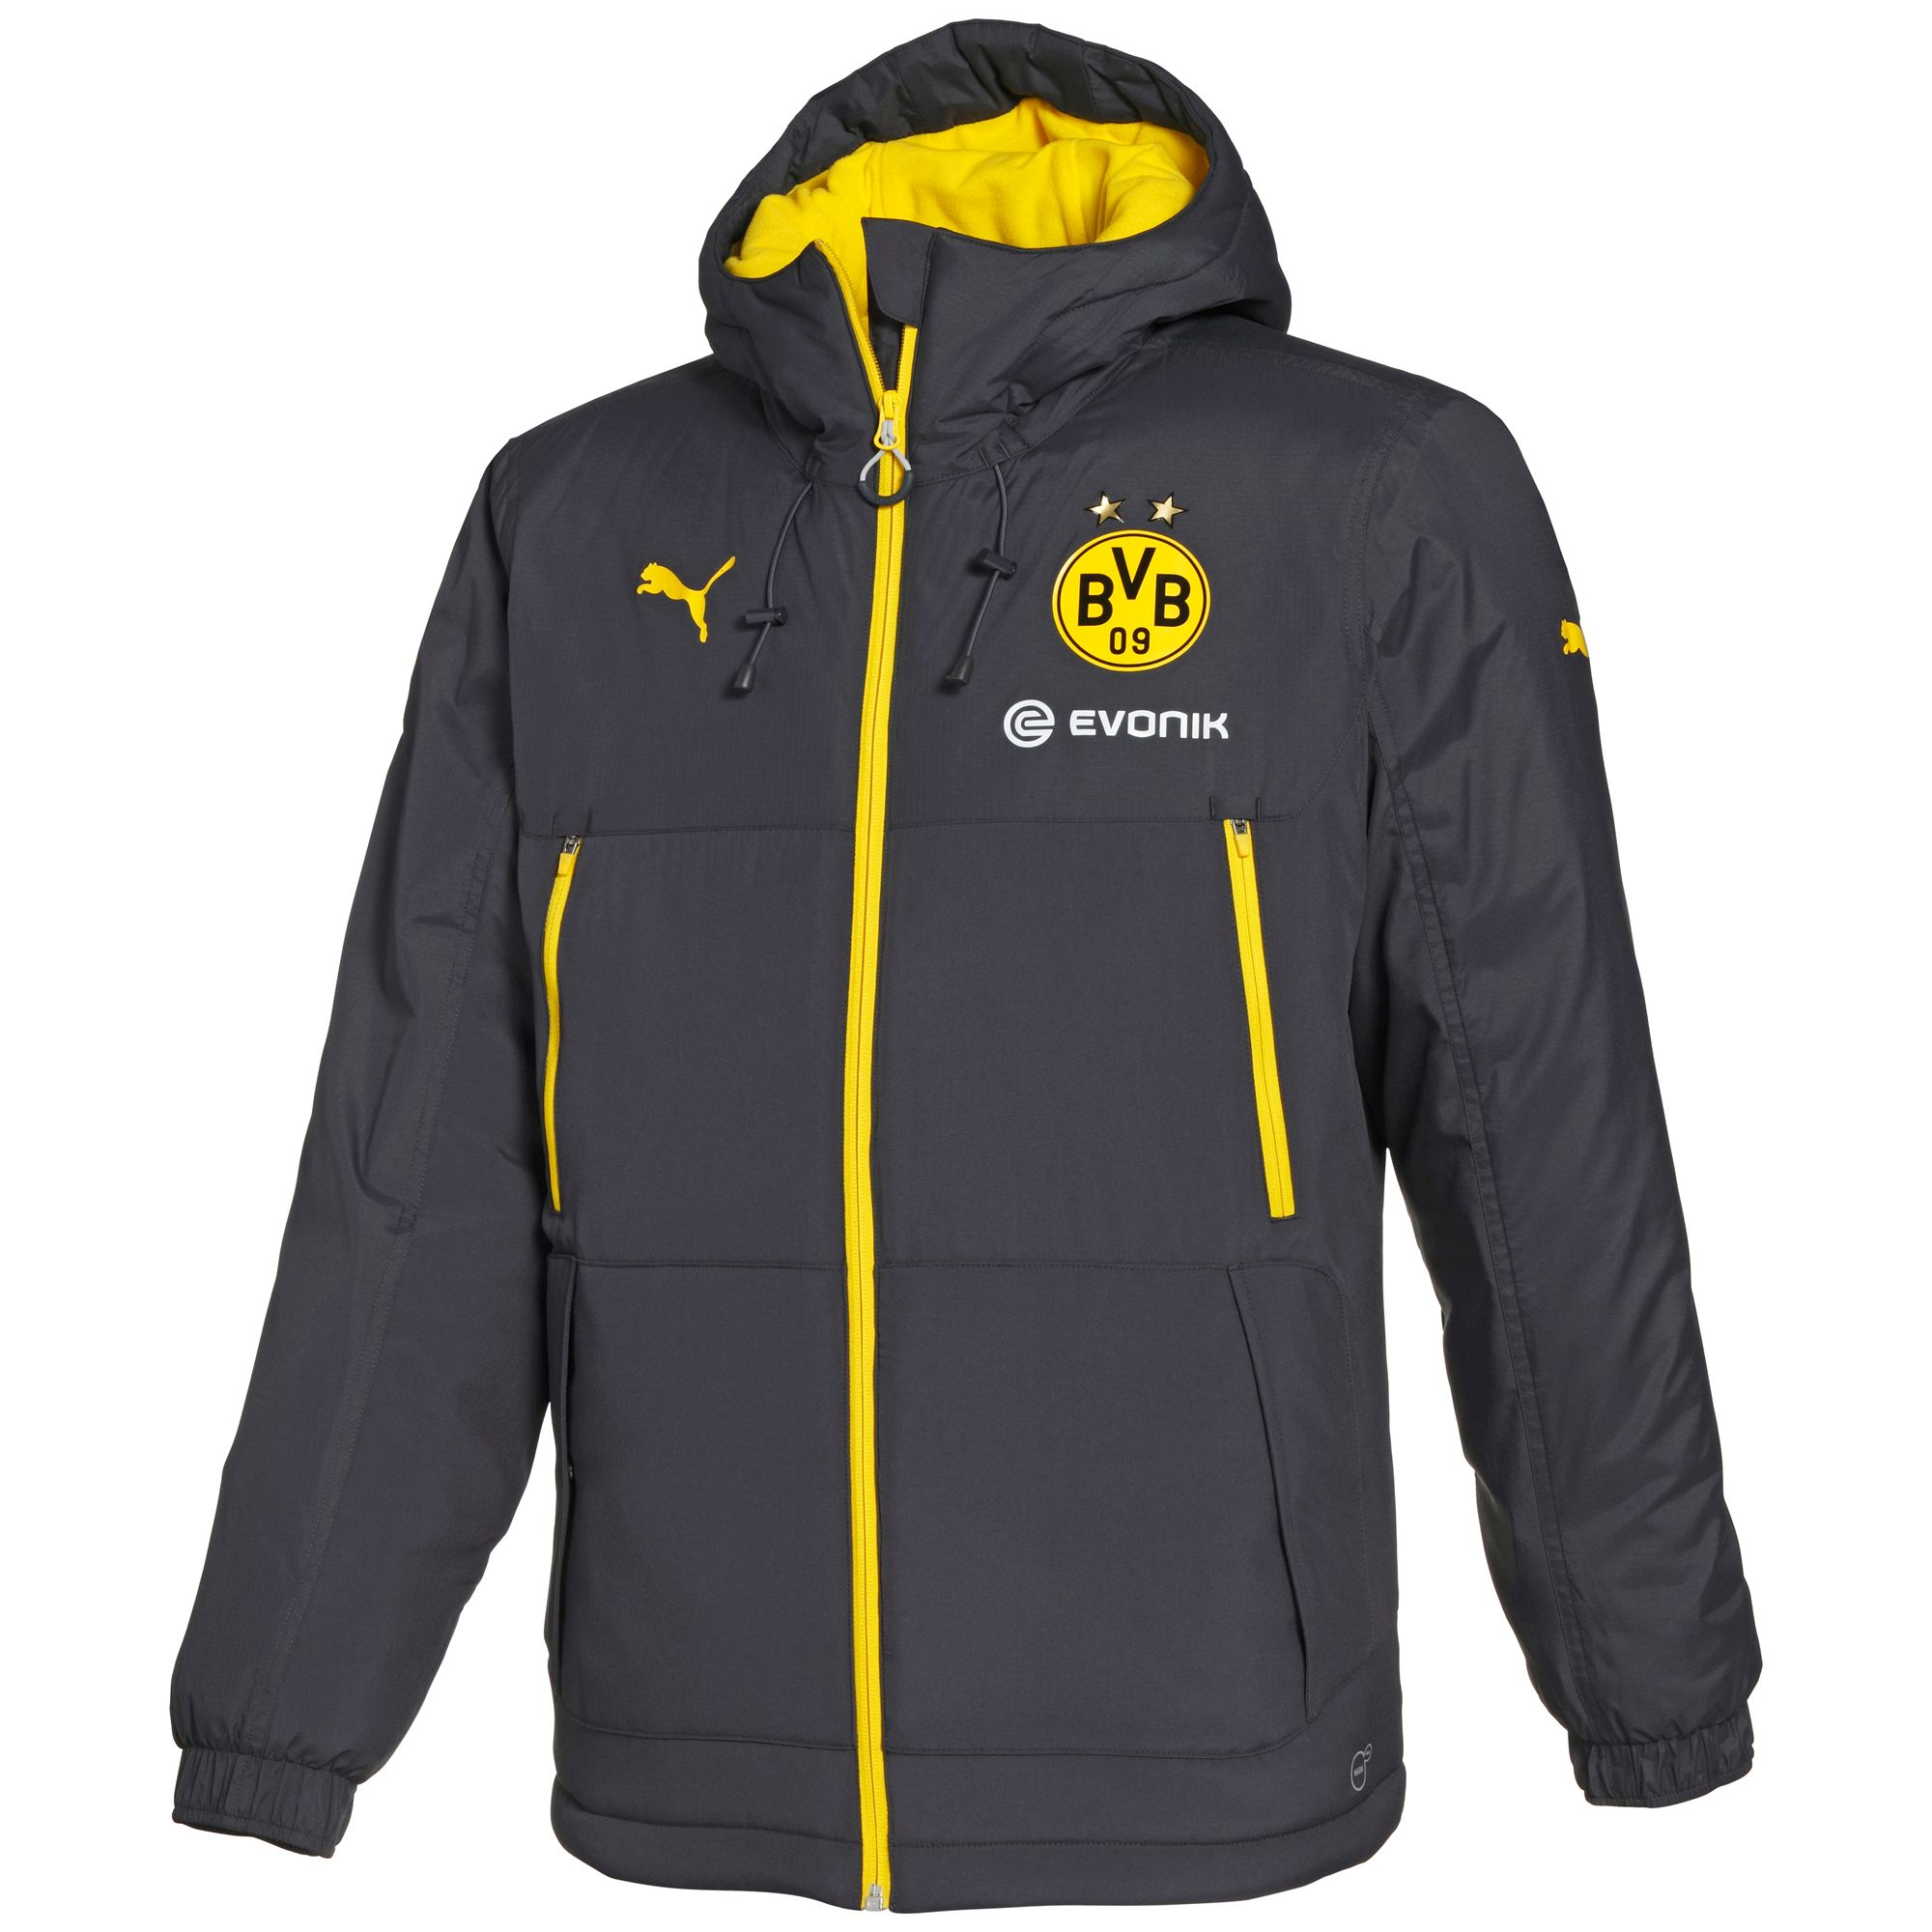 PUMA BVB Bench Jacket Apparel Winter Jackets Football Men